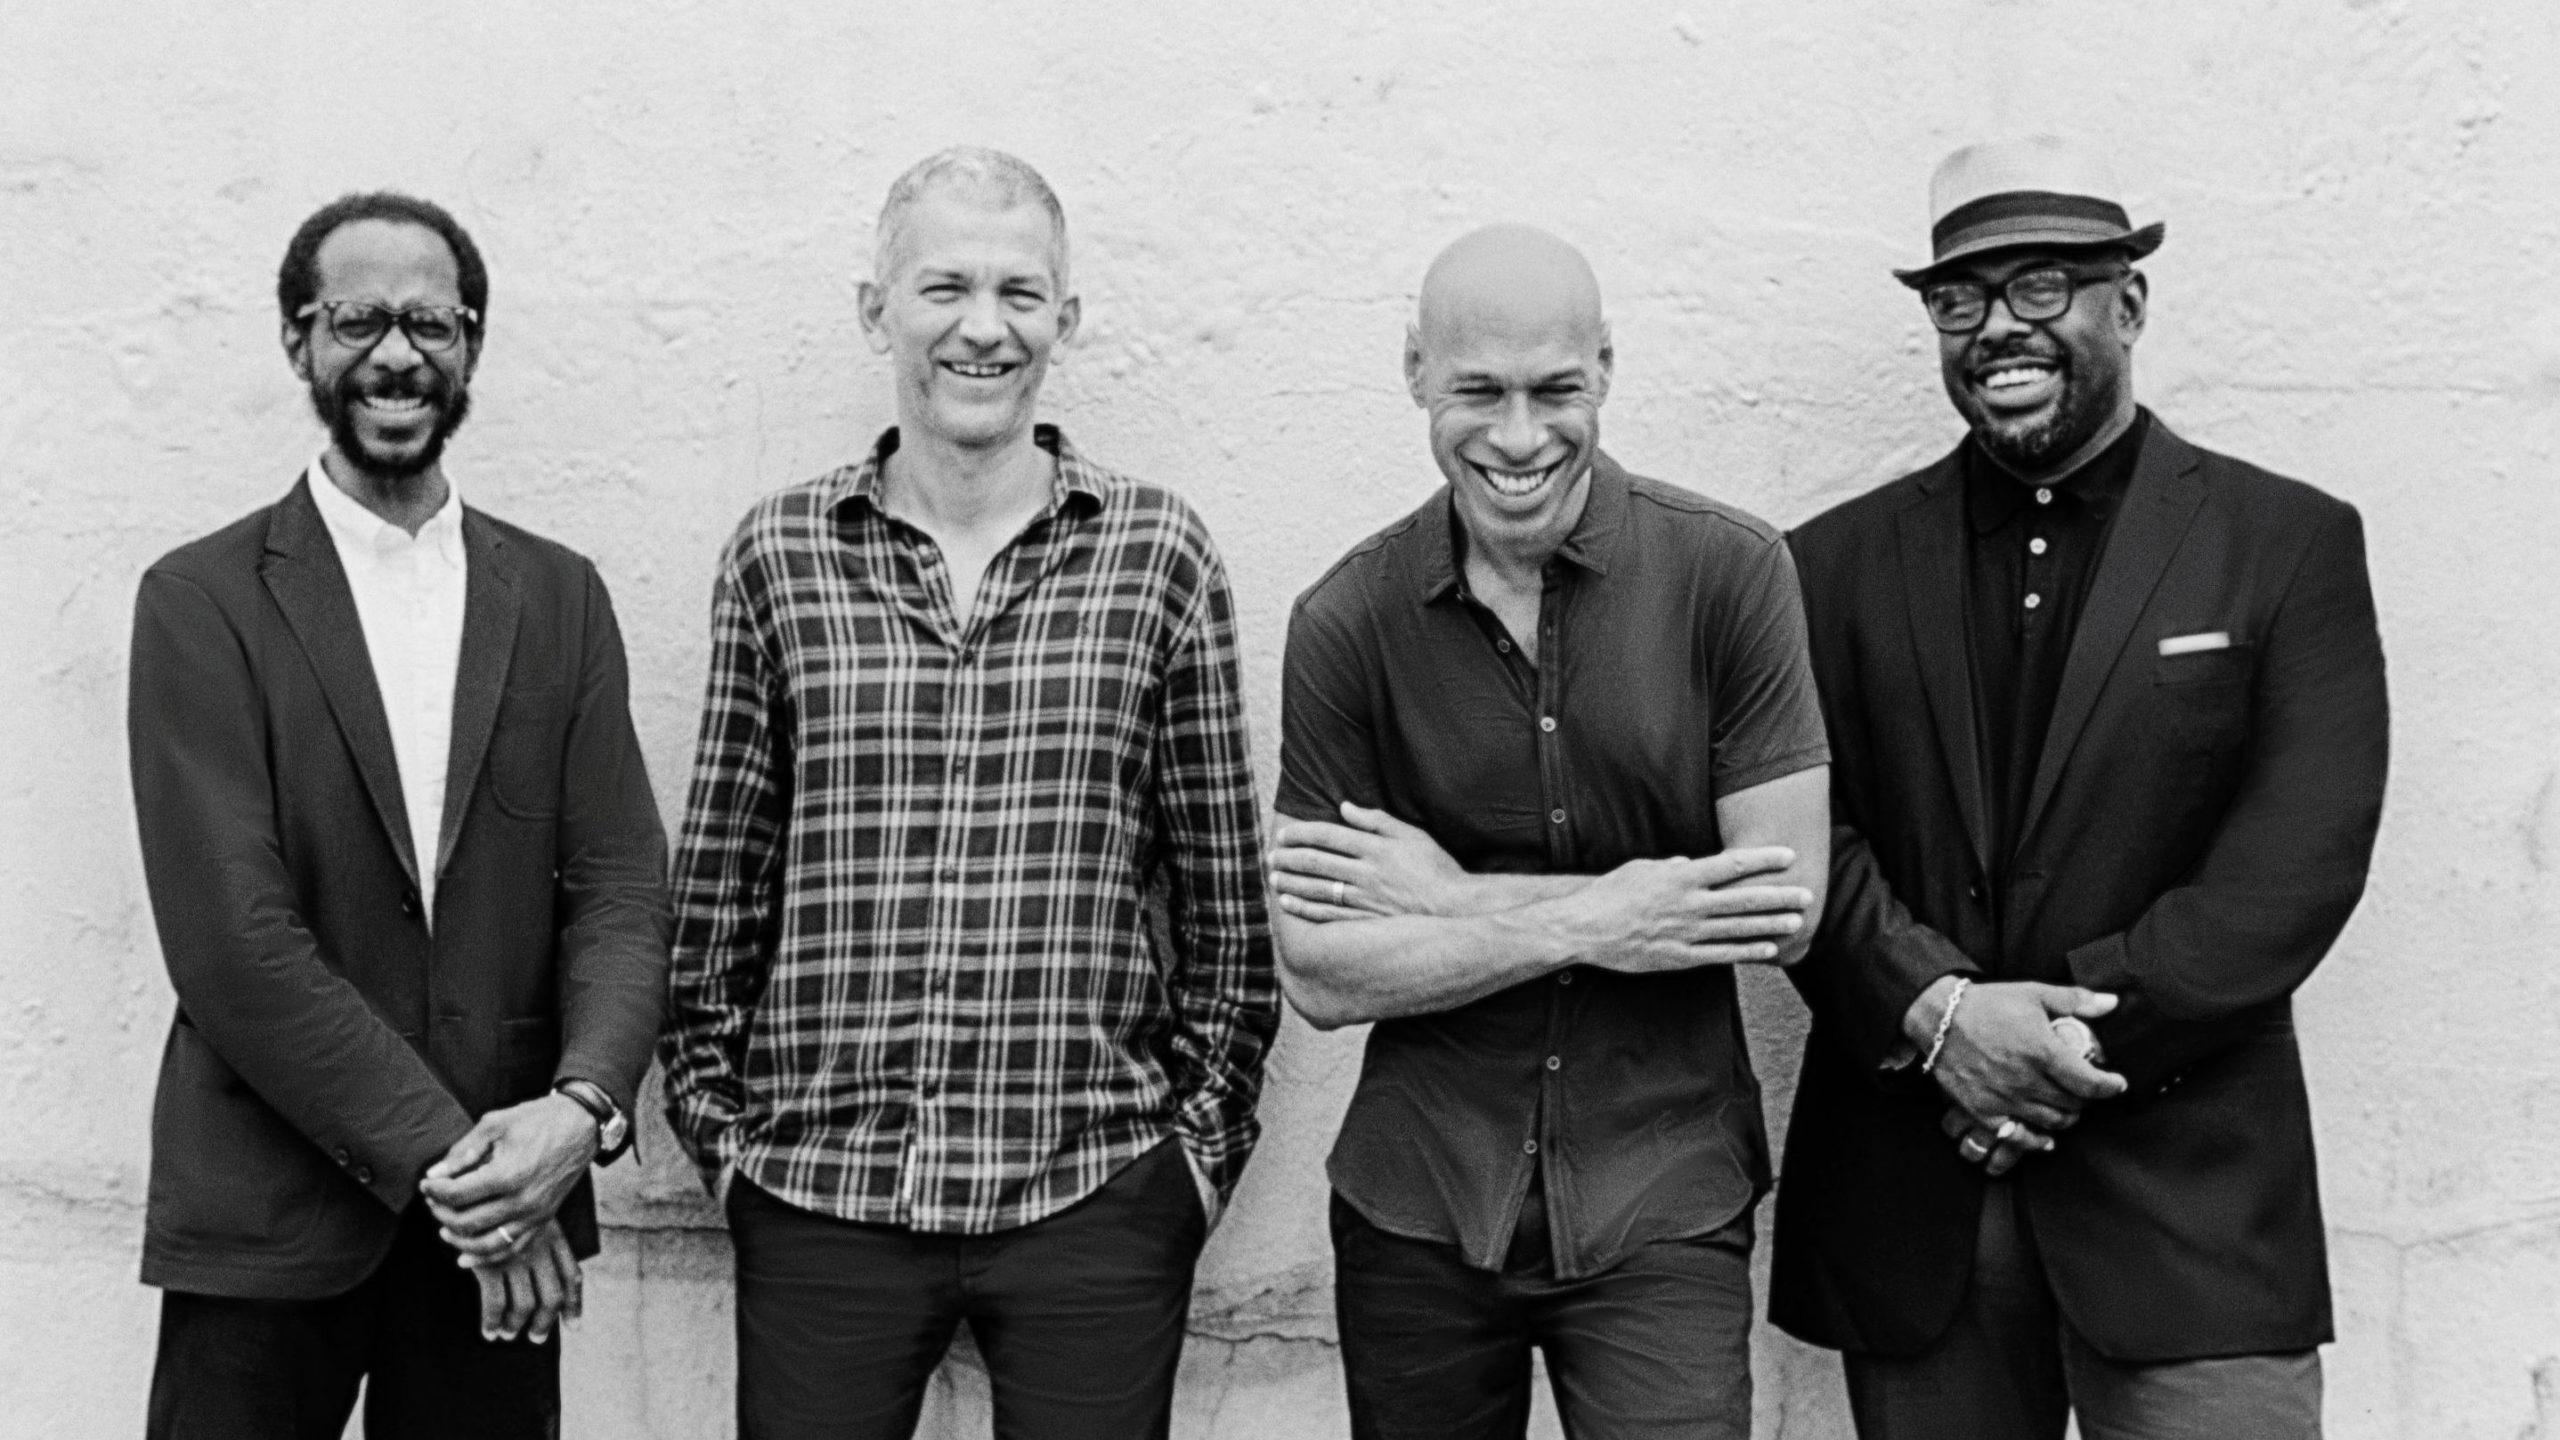 The Joshua Redman Quartet. From left: drummer Brian Blade, pianist Brad Mehldau, saxophonist Joshua Redman and bassist Christian McBride.